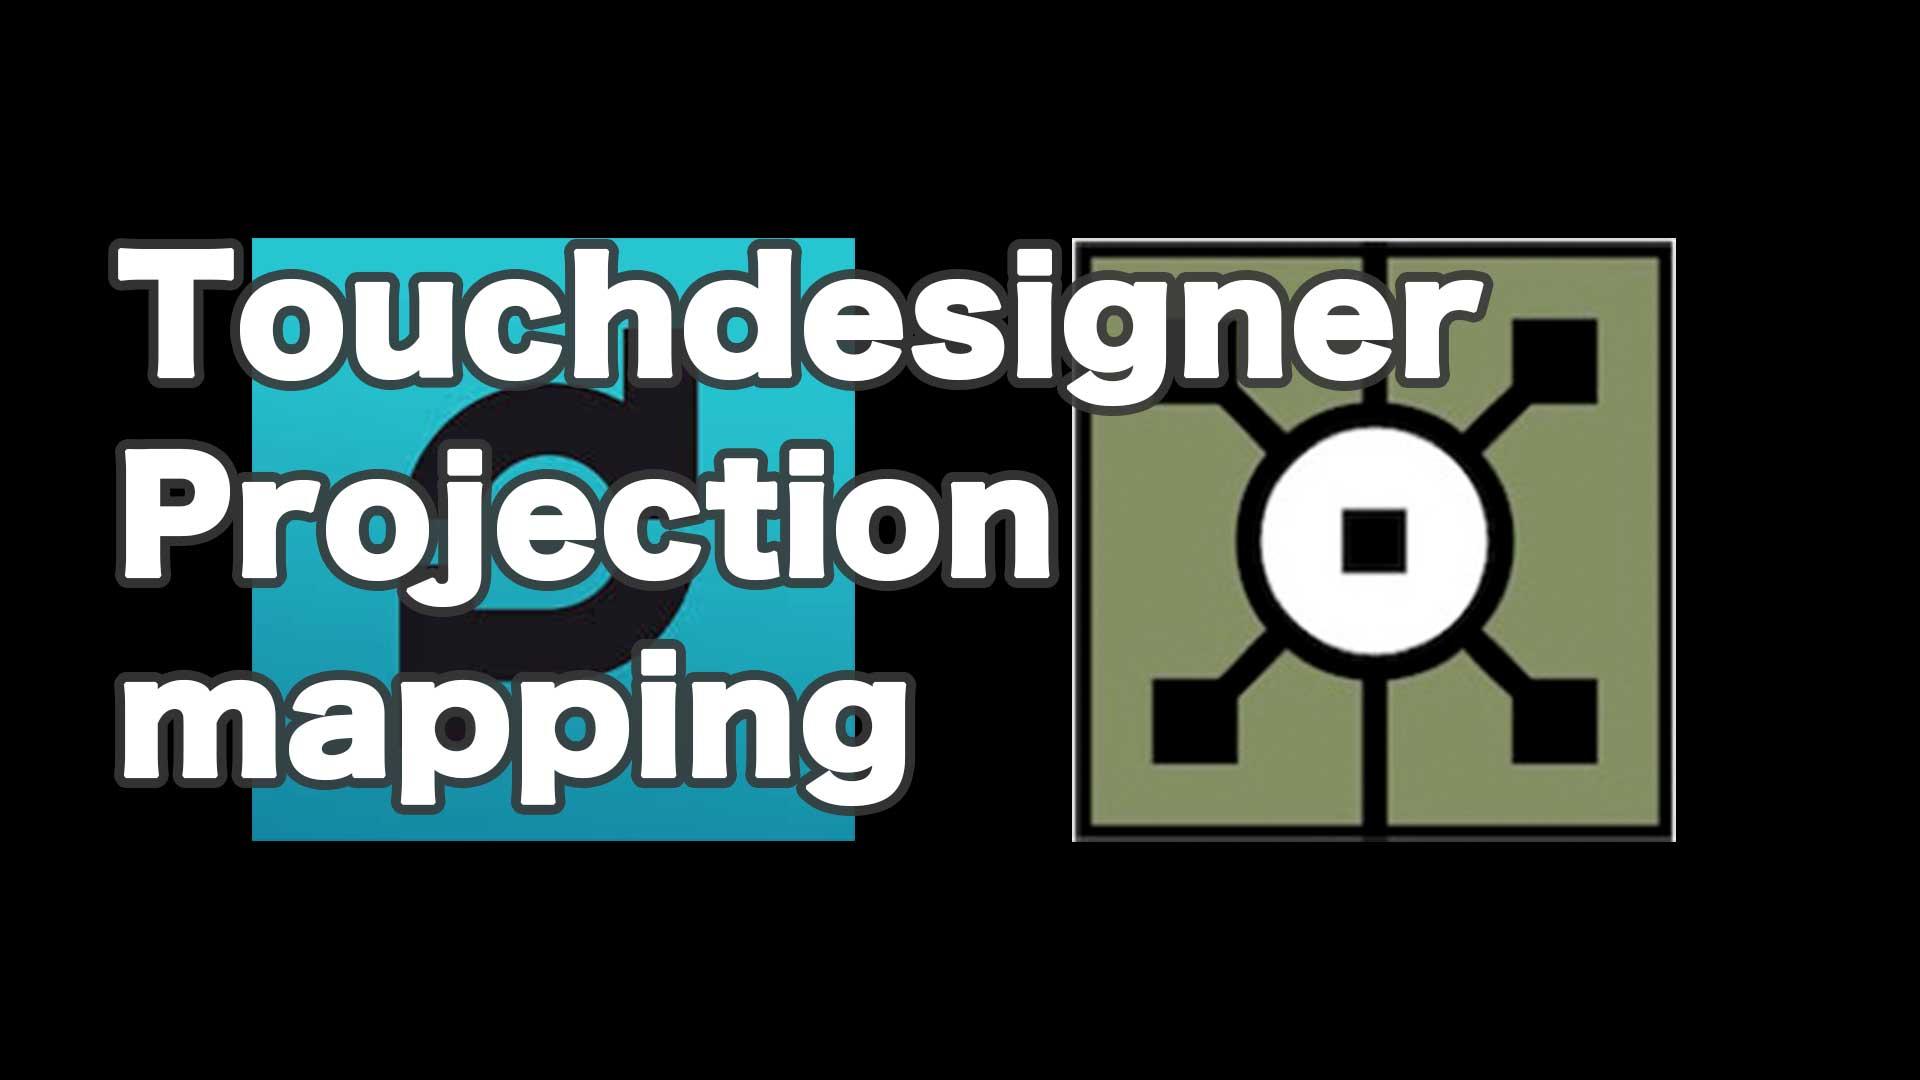 Touchdesigner プロジェクションマッピング